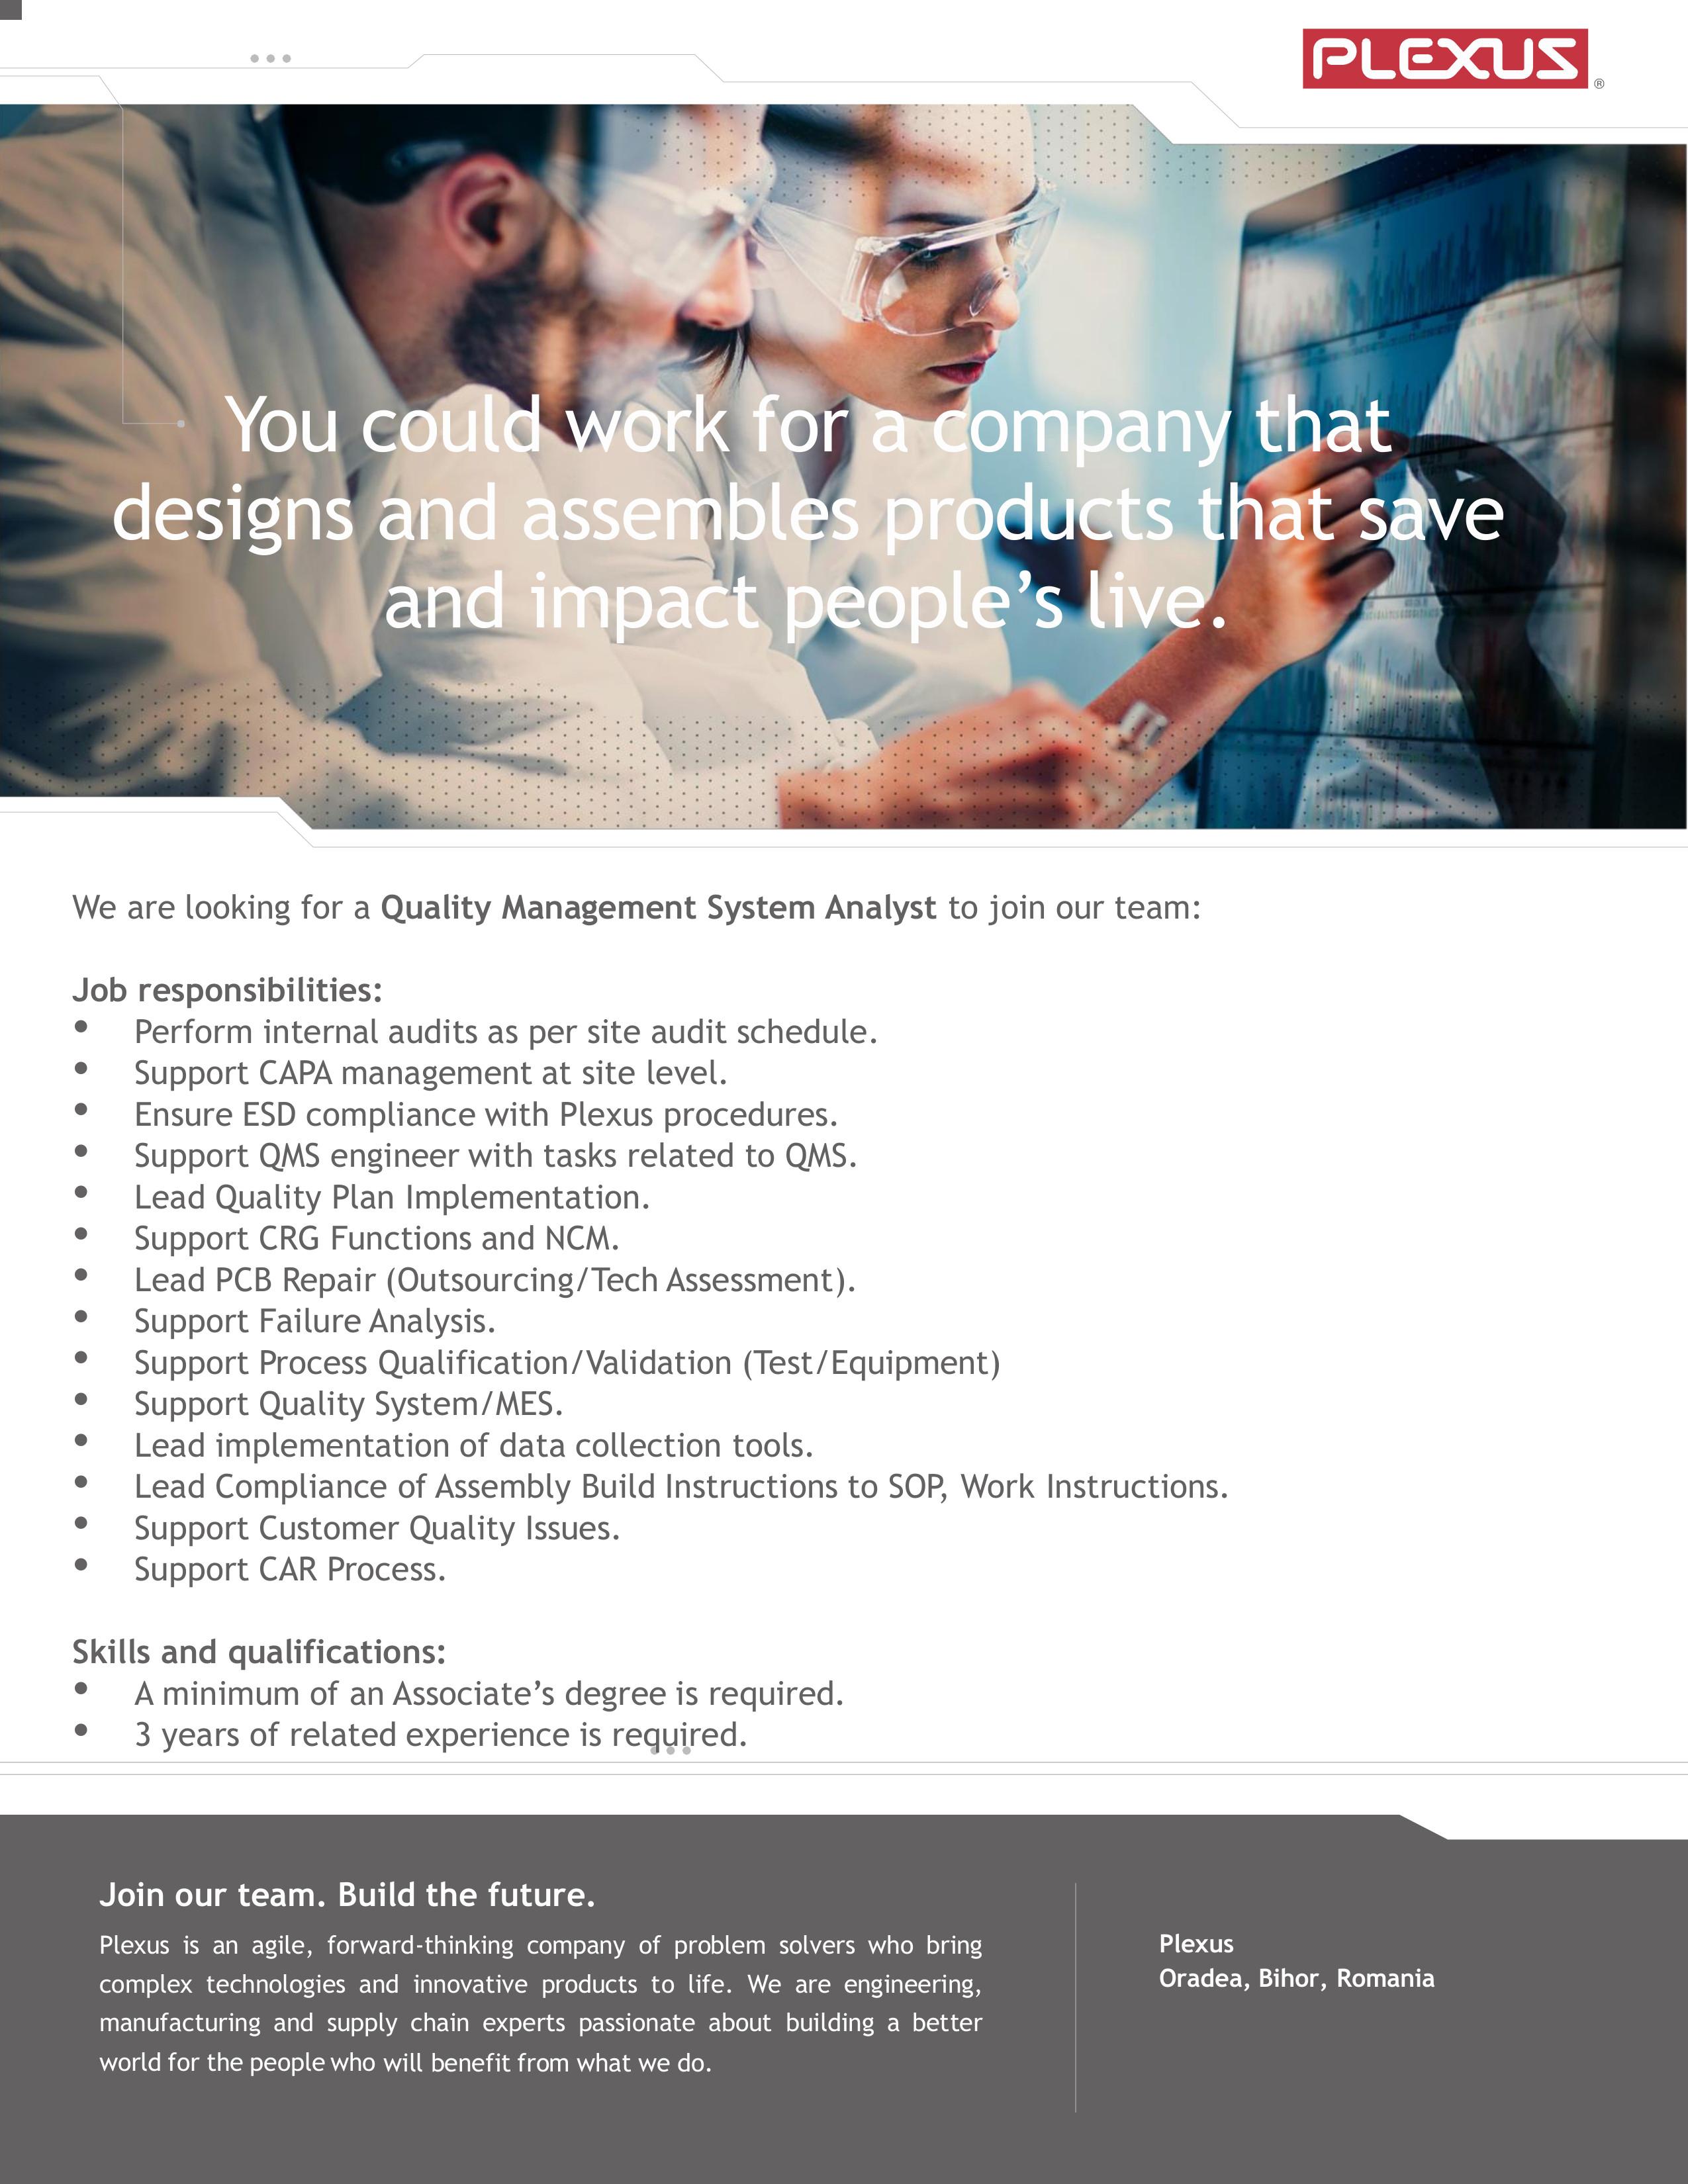 Quality Management Systen Analyst